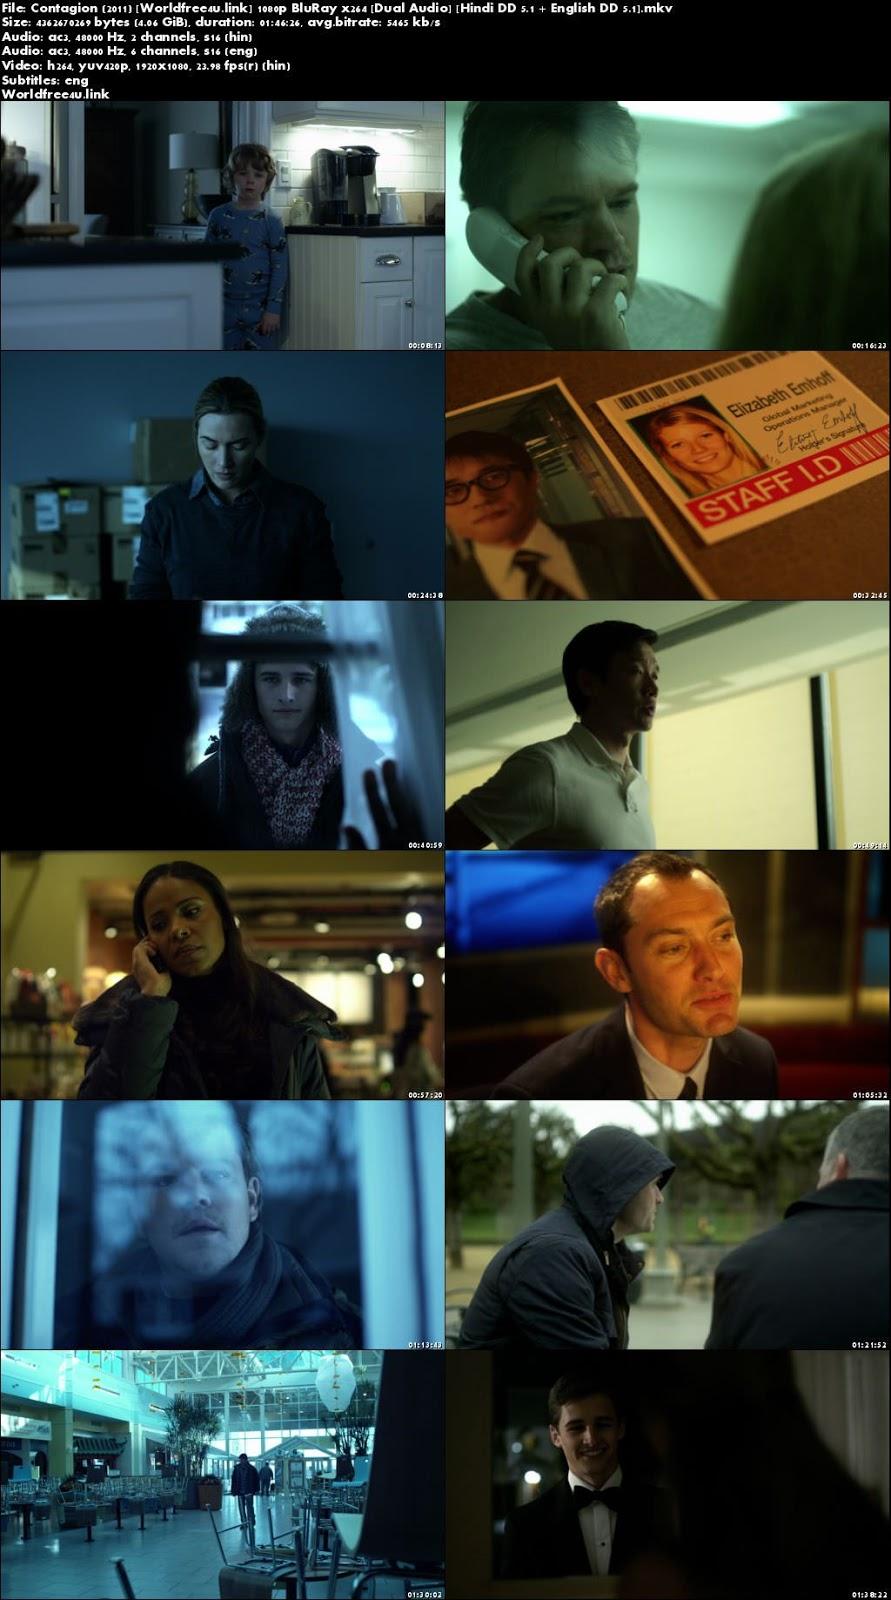 Screen Shoot of Contagion 2011 BRRip 1080p Dual Audio Hindi English